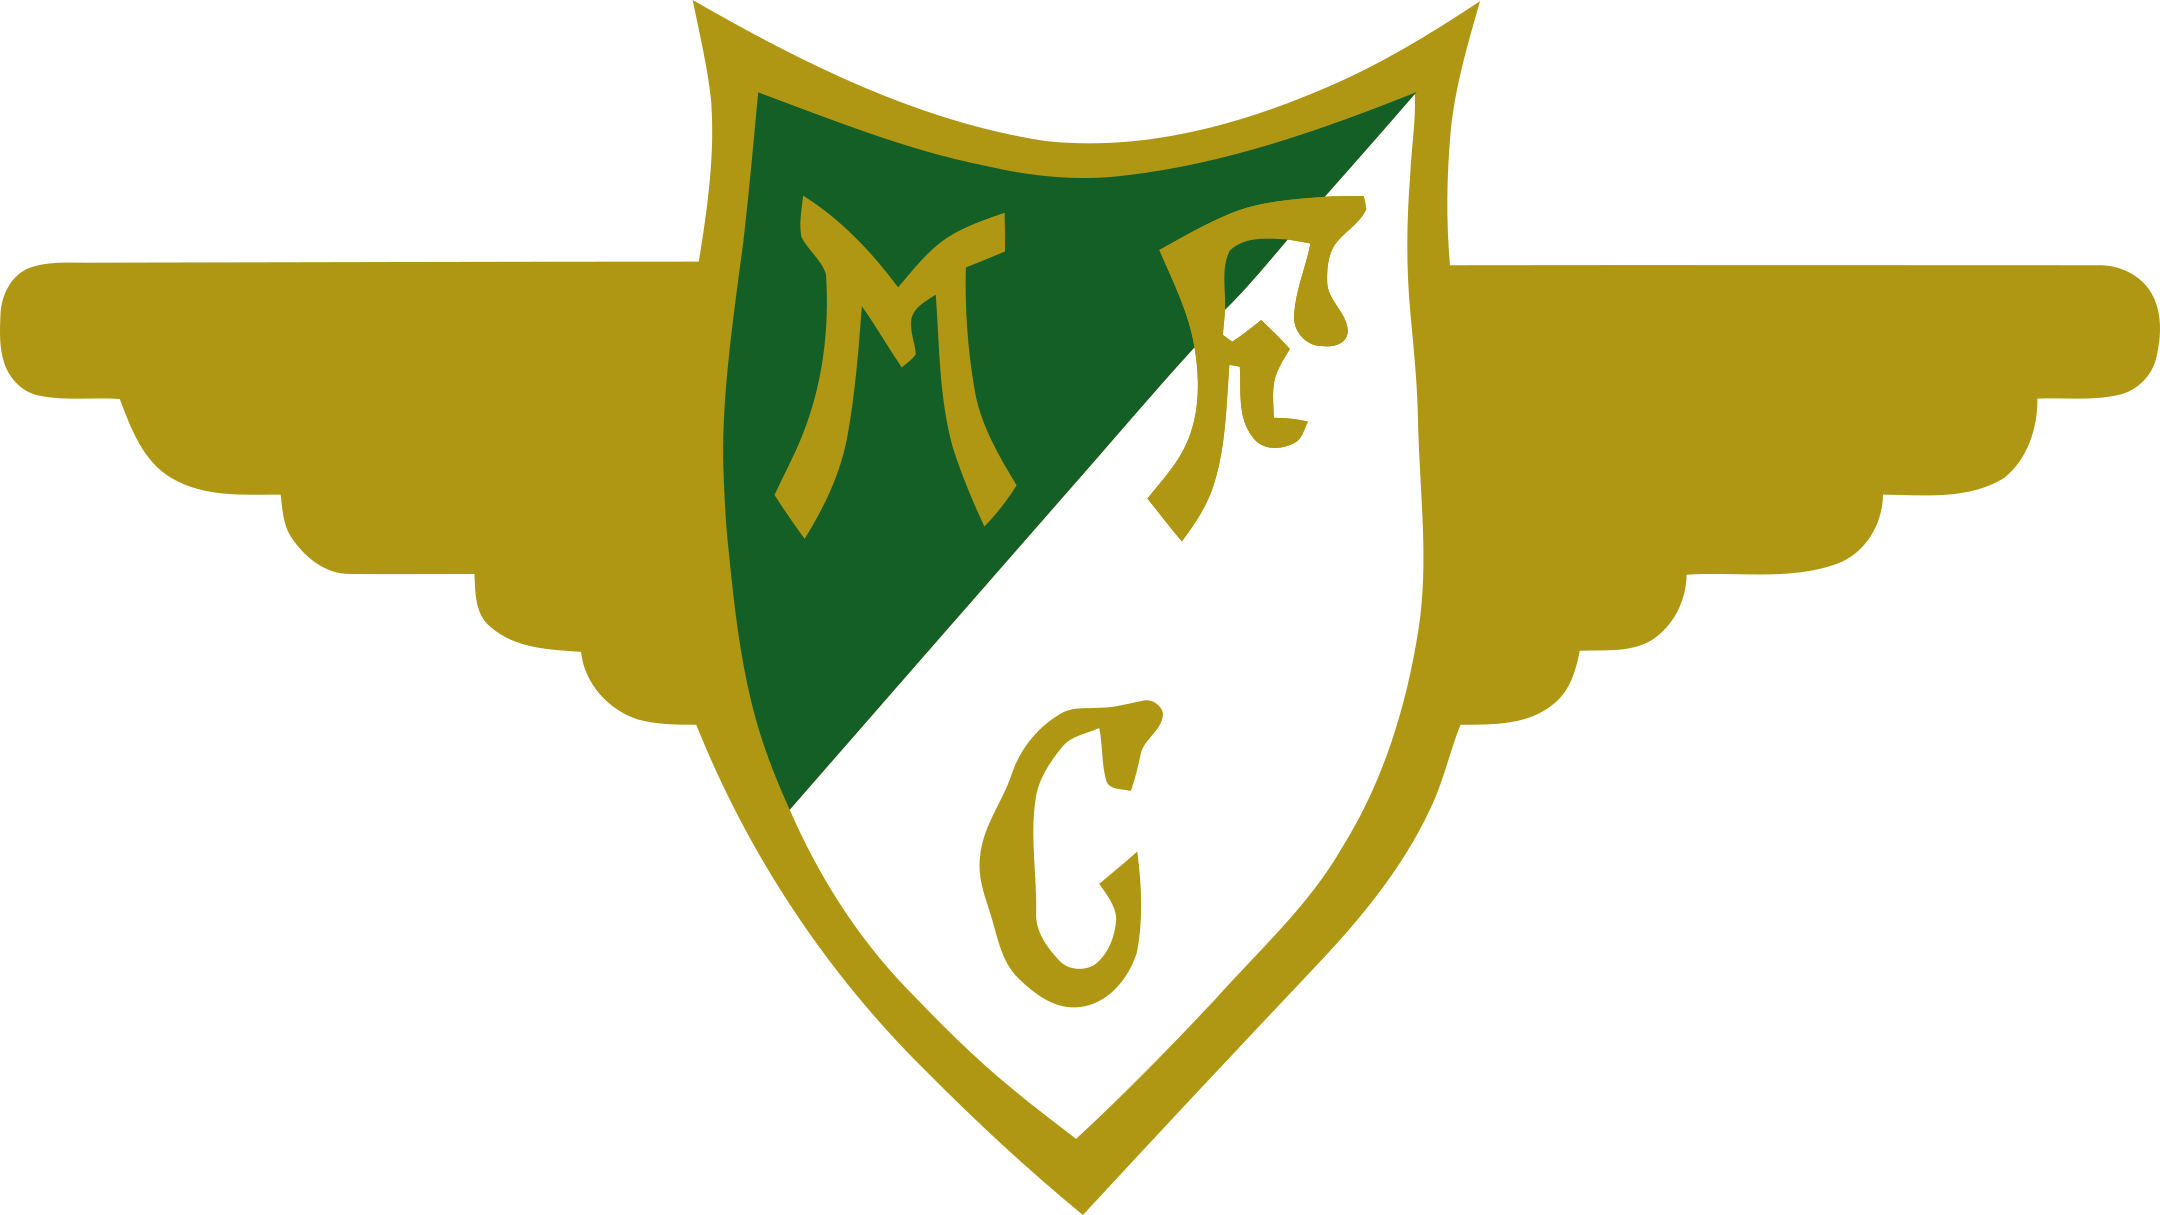 moreirense fc logo 1 - Moreirense FC Logo